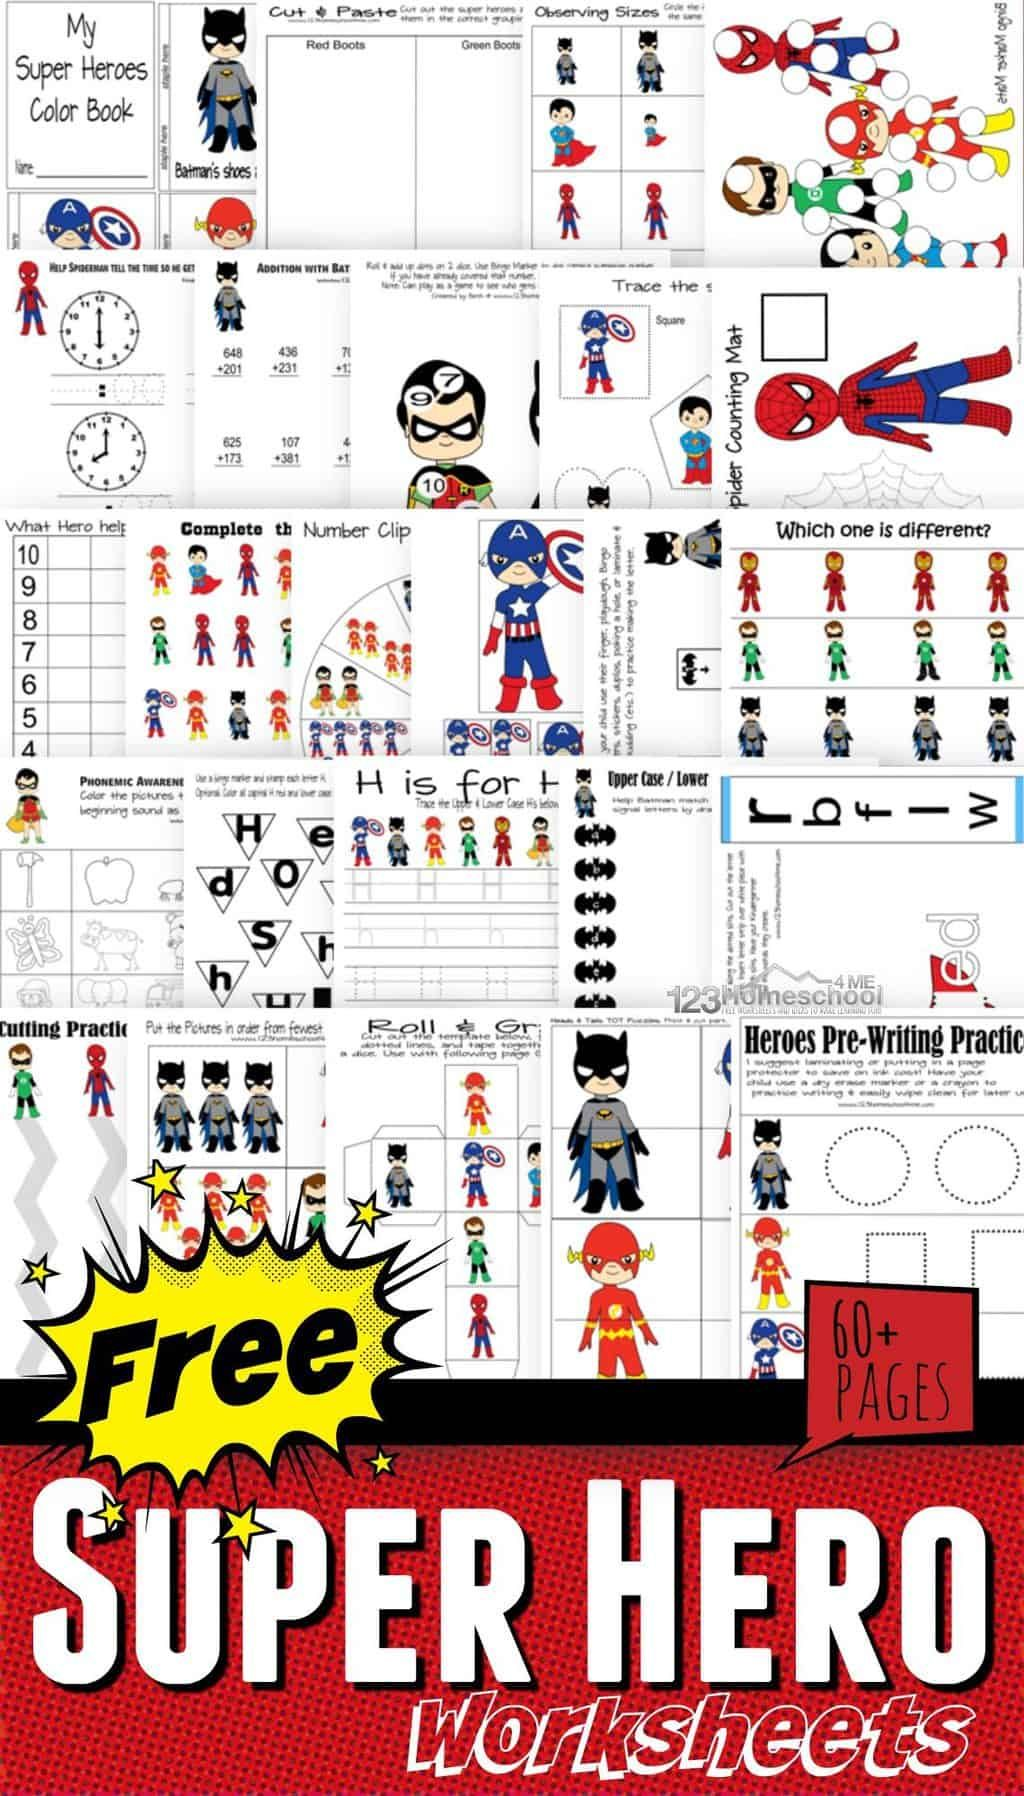 Superhero Worksheets For Kids In